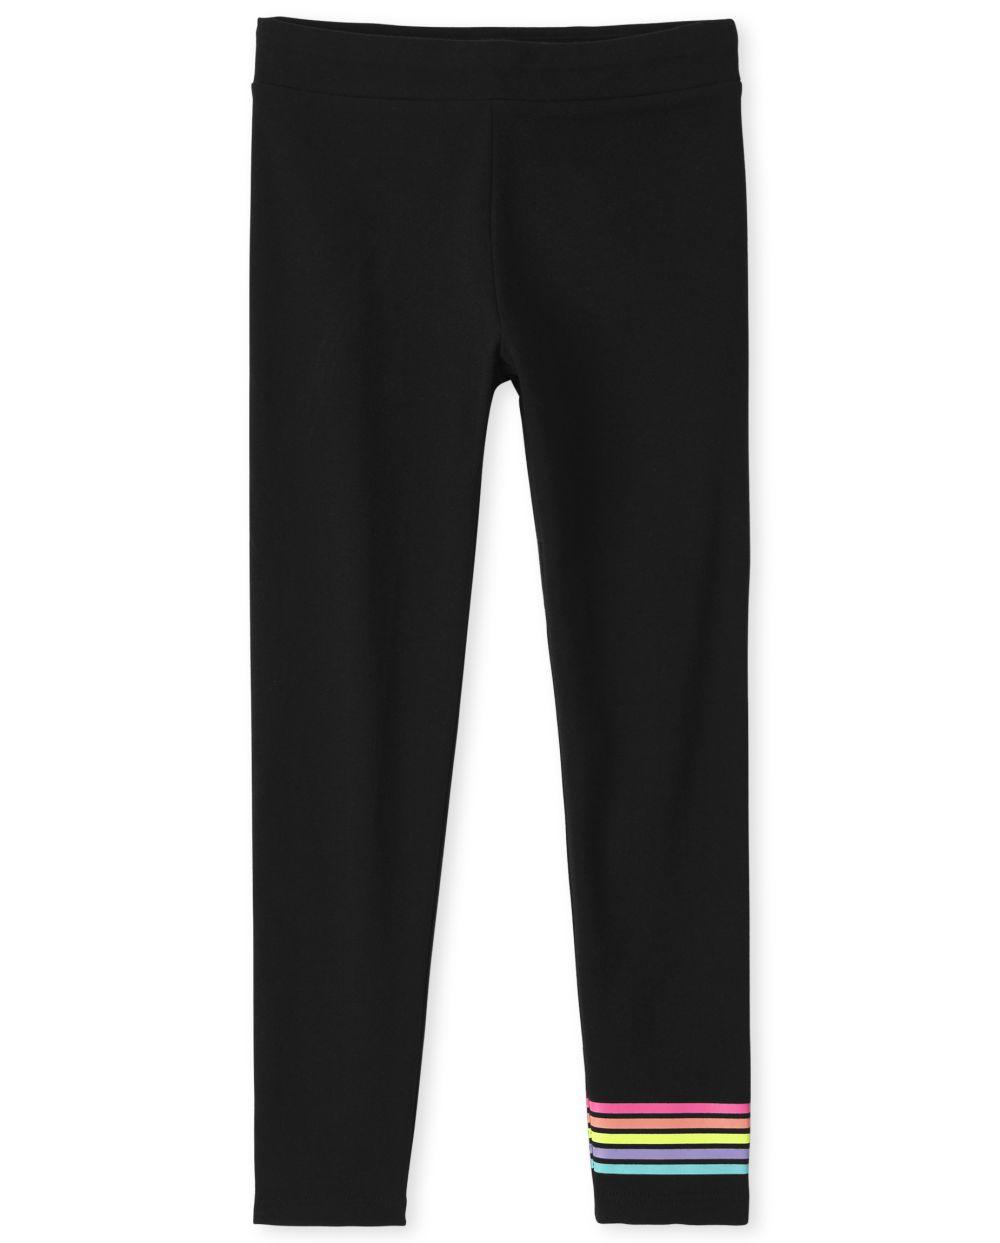 Girls Rainbow Striped Leggings - Black